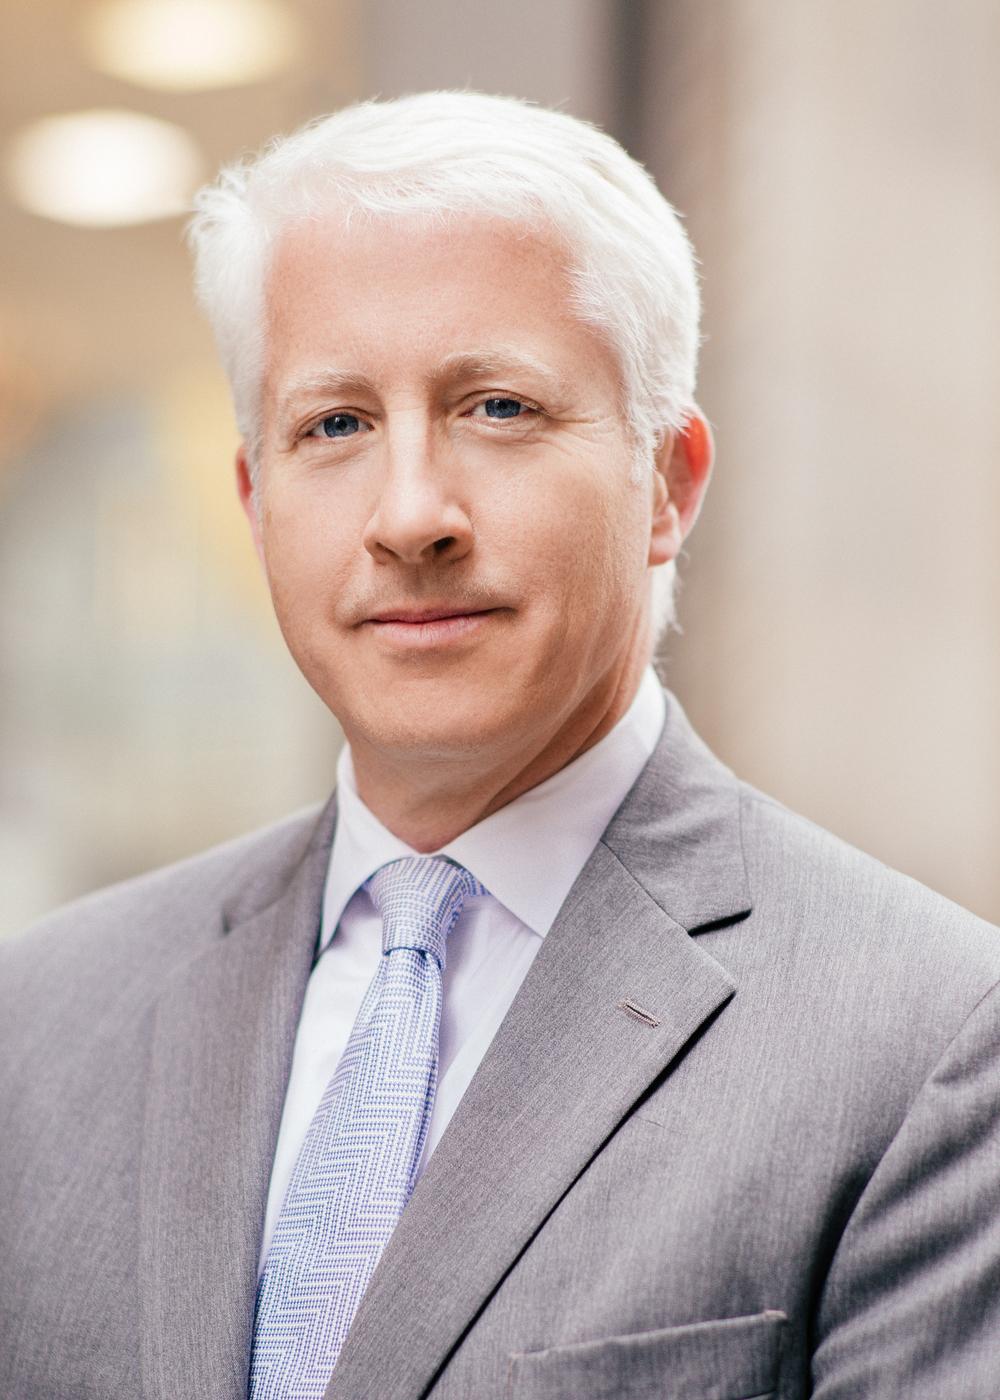 CEO-portrait-corporate-headshot-12.jpg